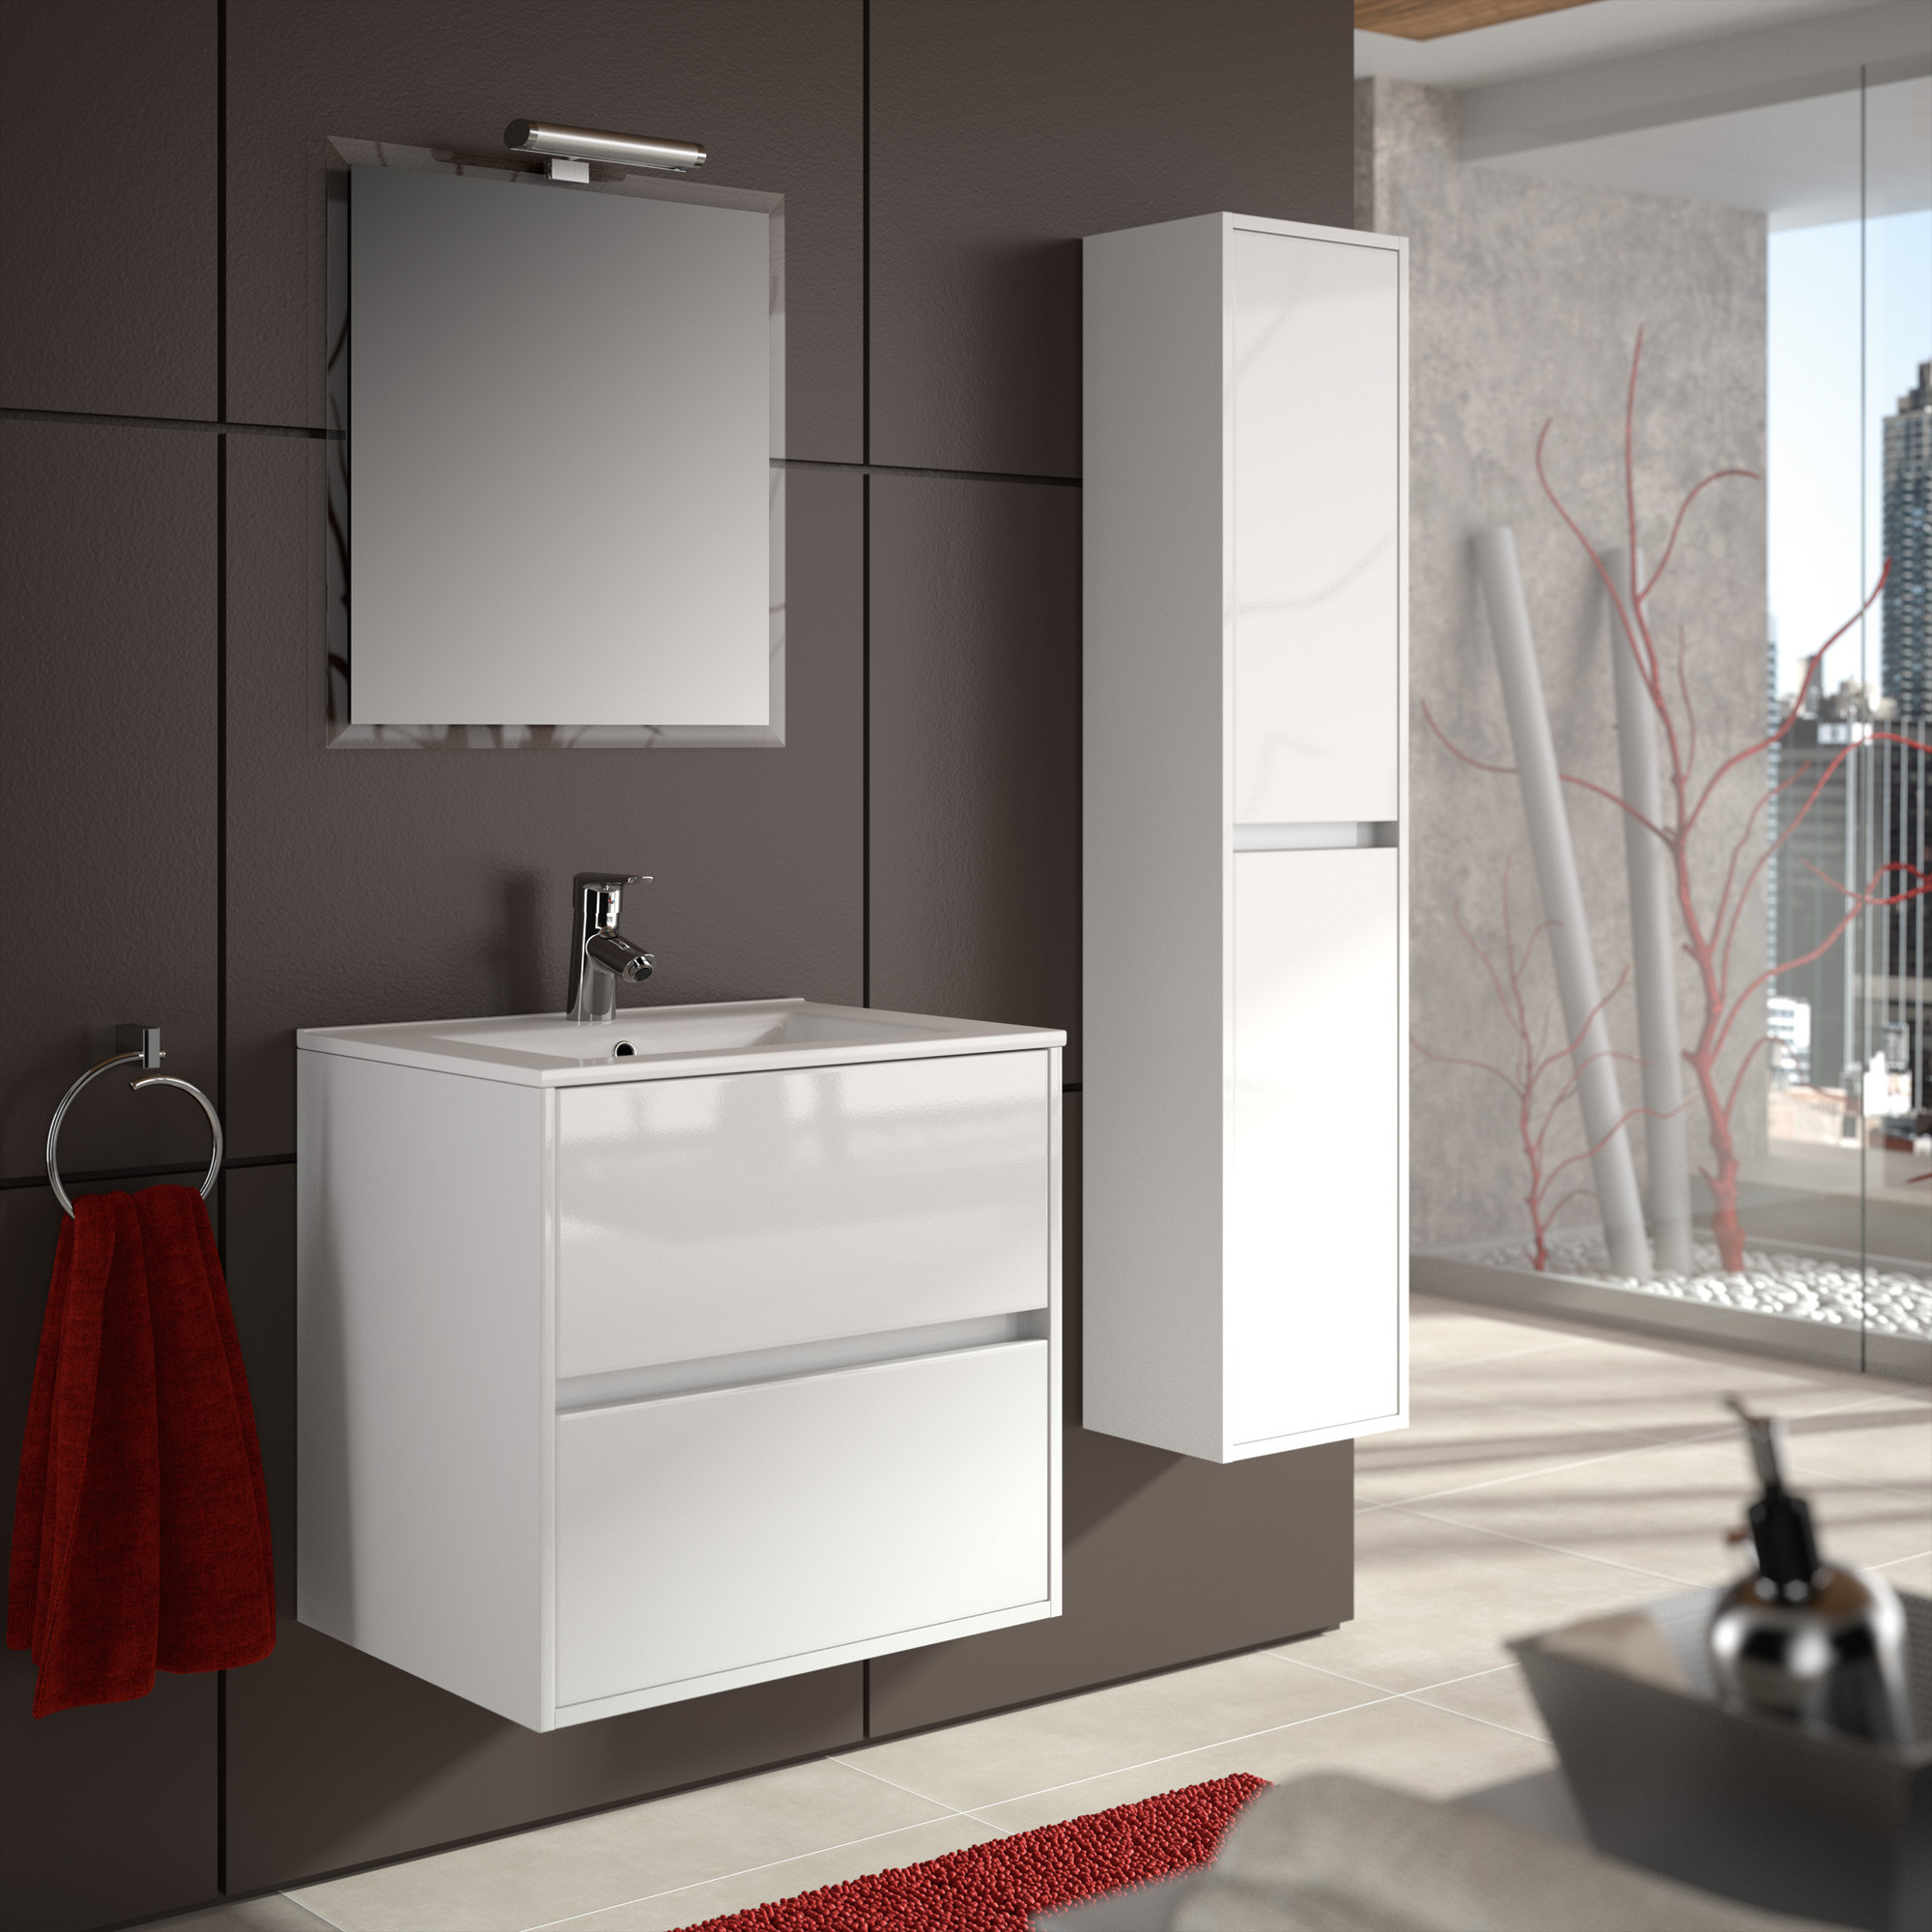 Meuble salle de bain bois blanc - Meuble salle de bain bois blanc ...